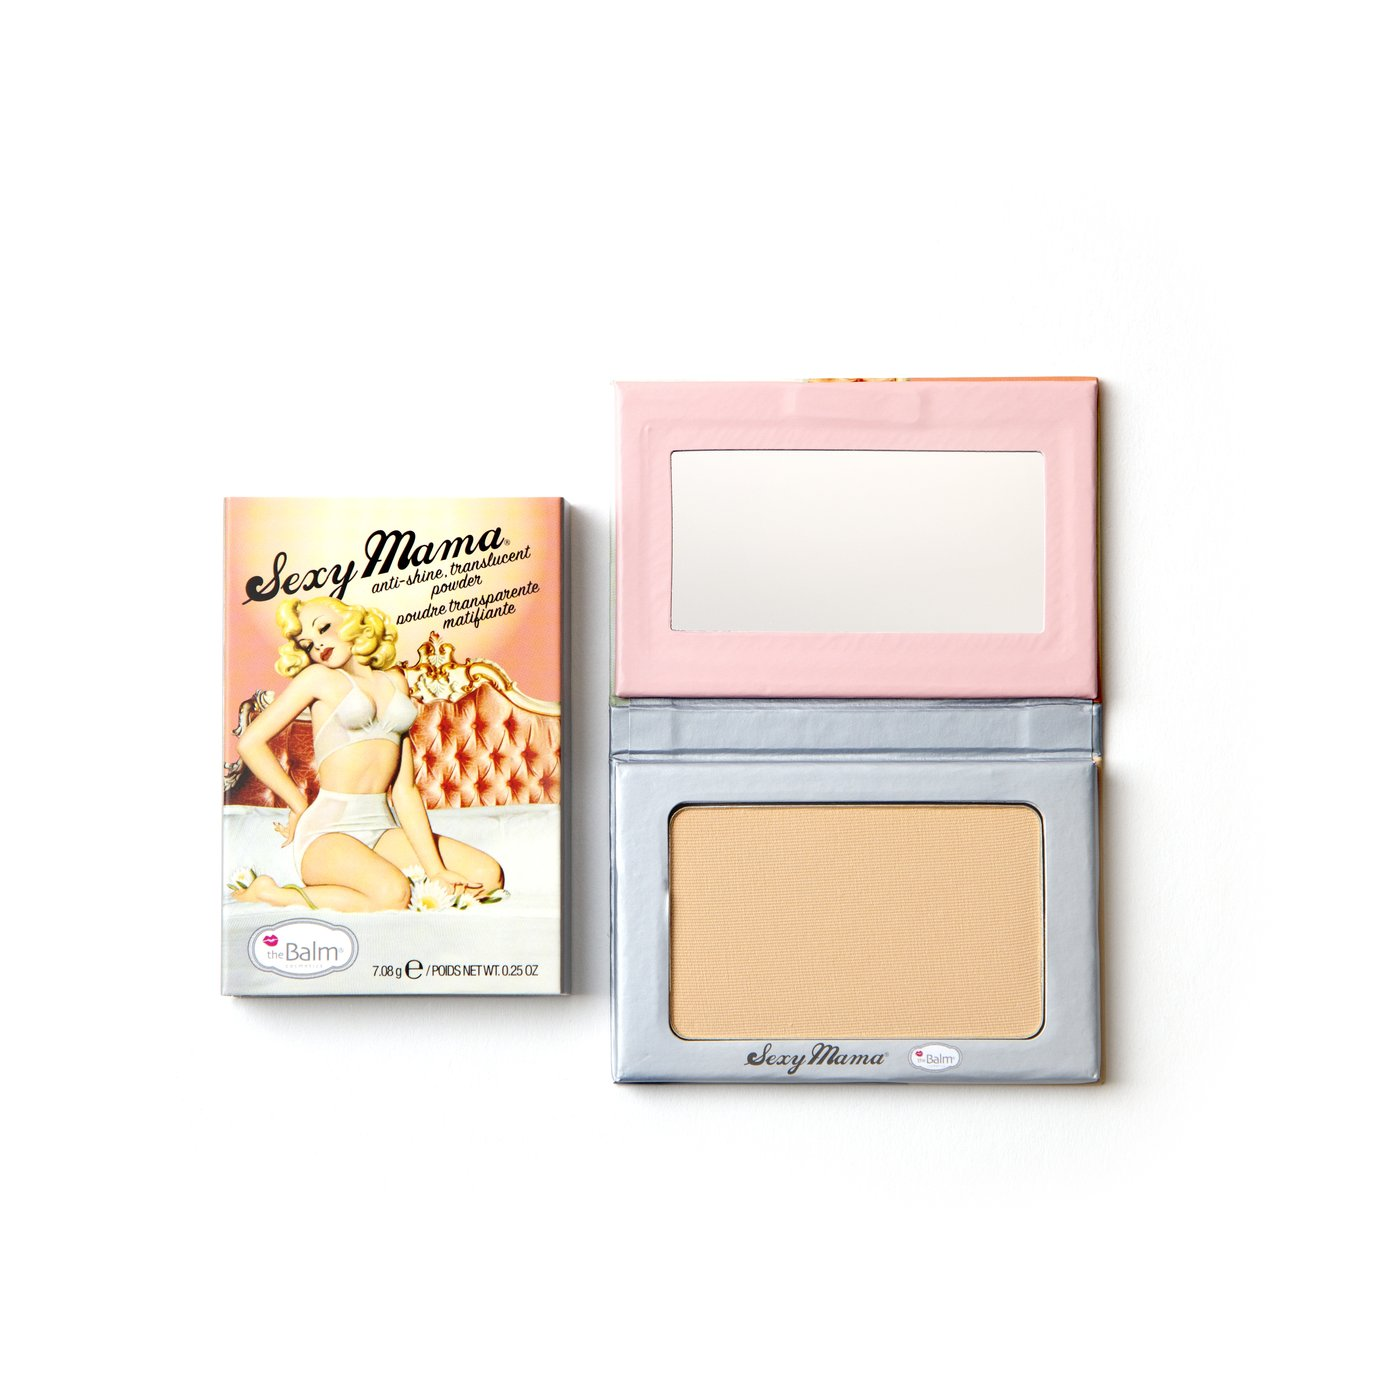 Sexy Mama Anti Shine Translucent Powder